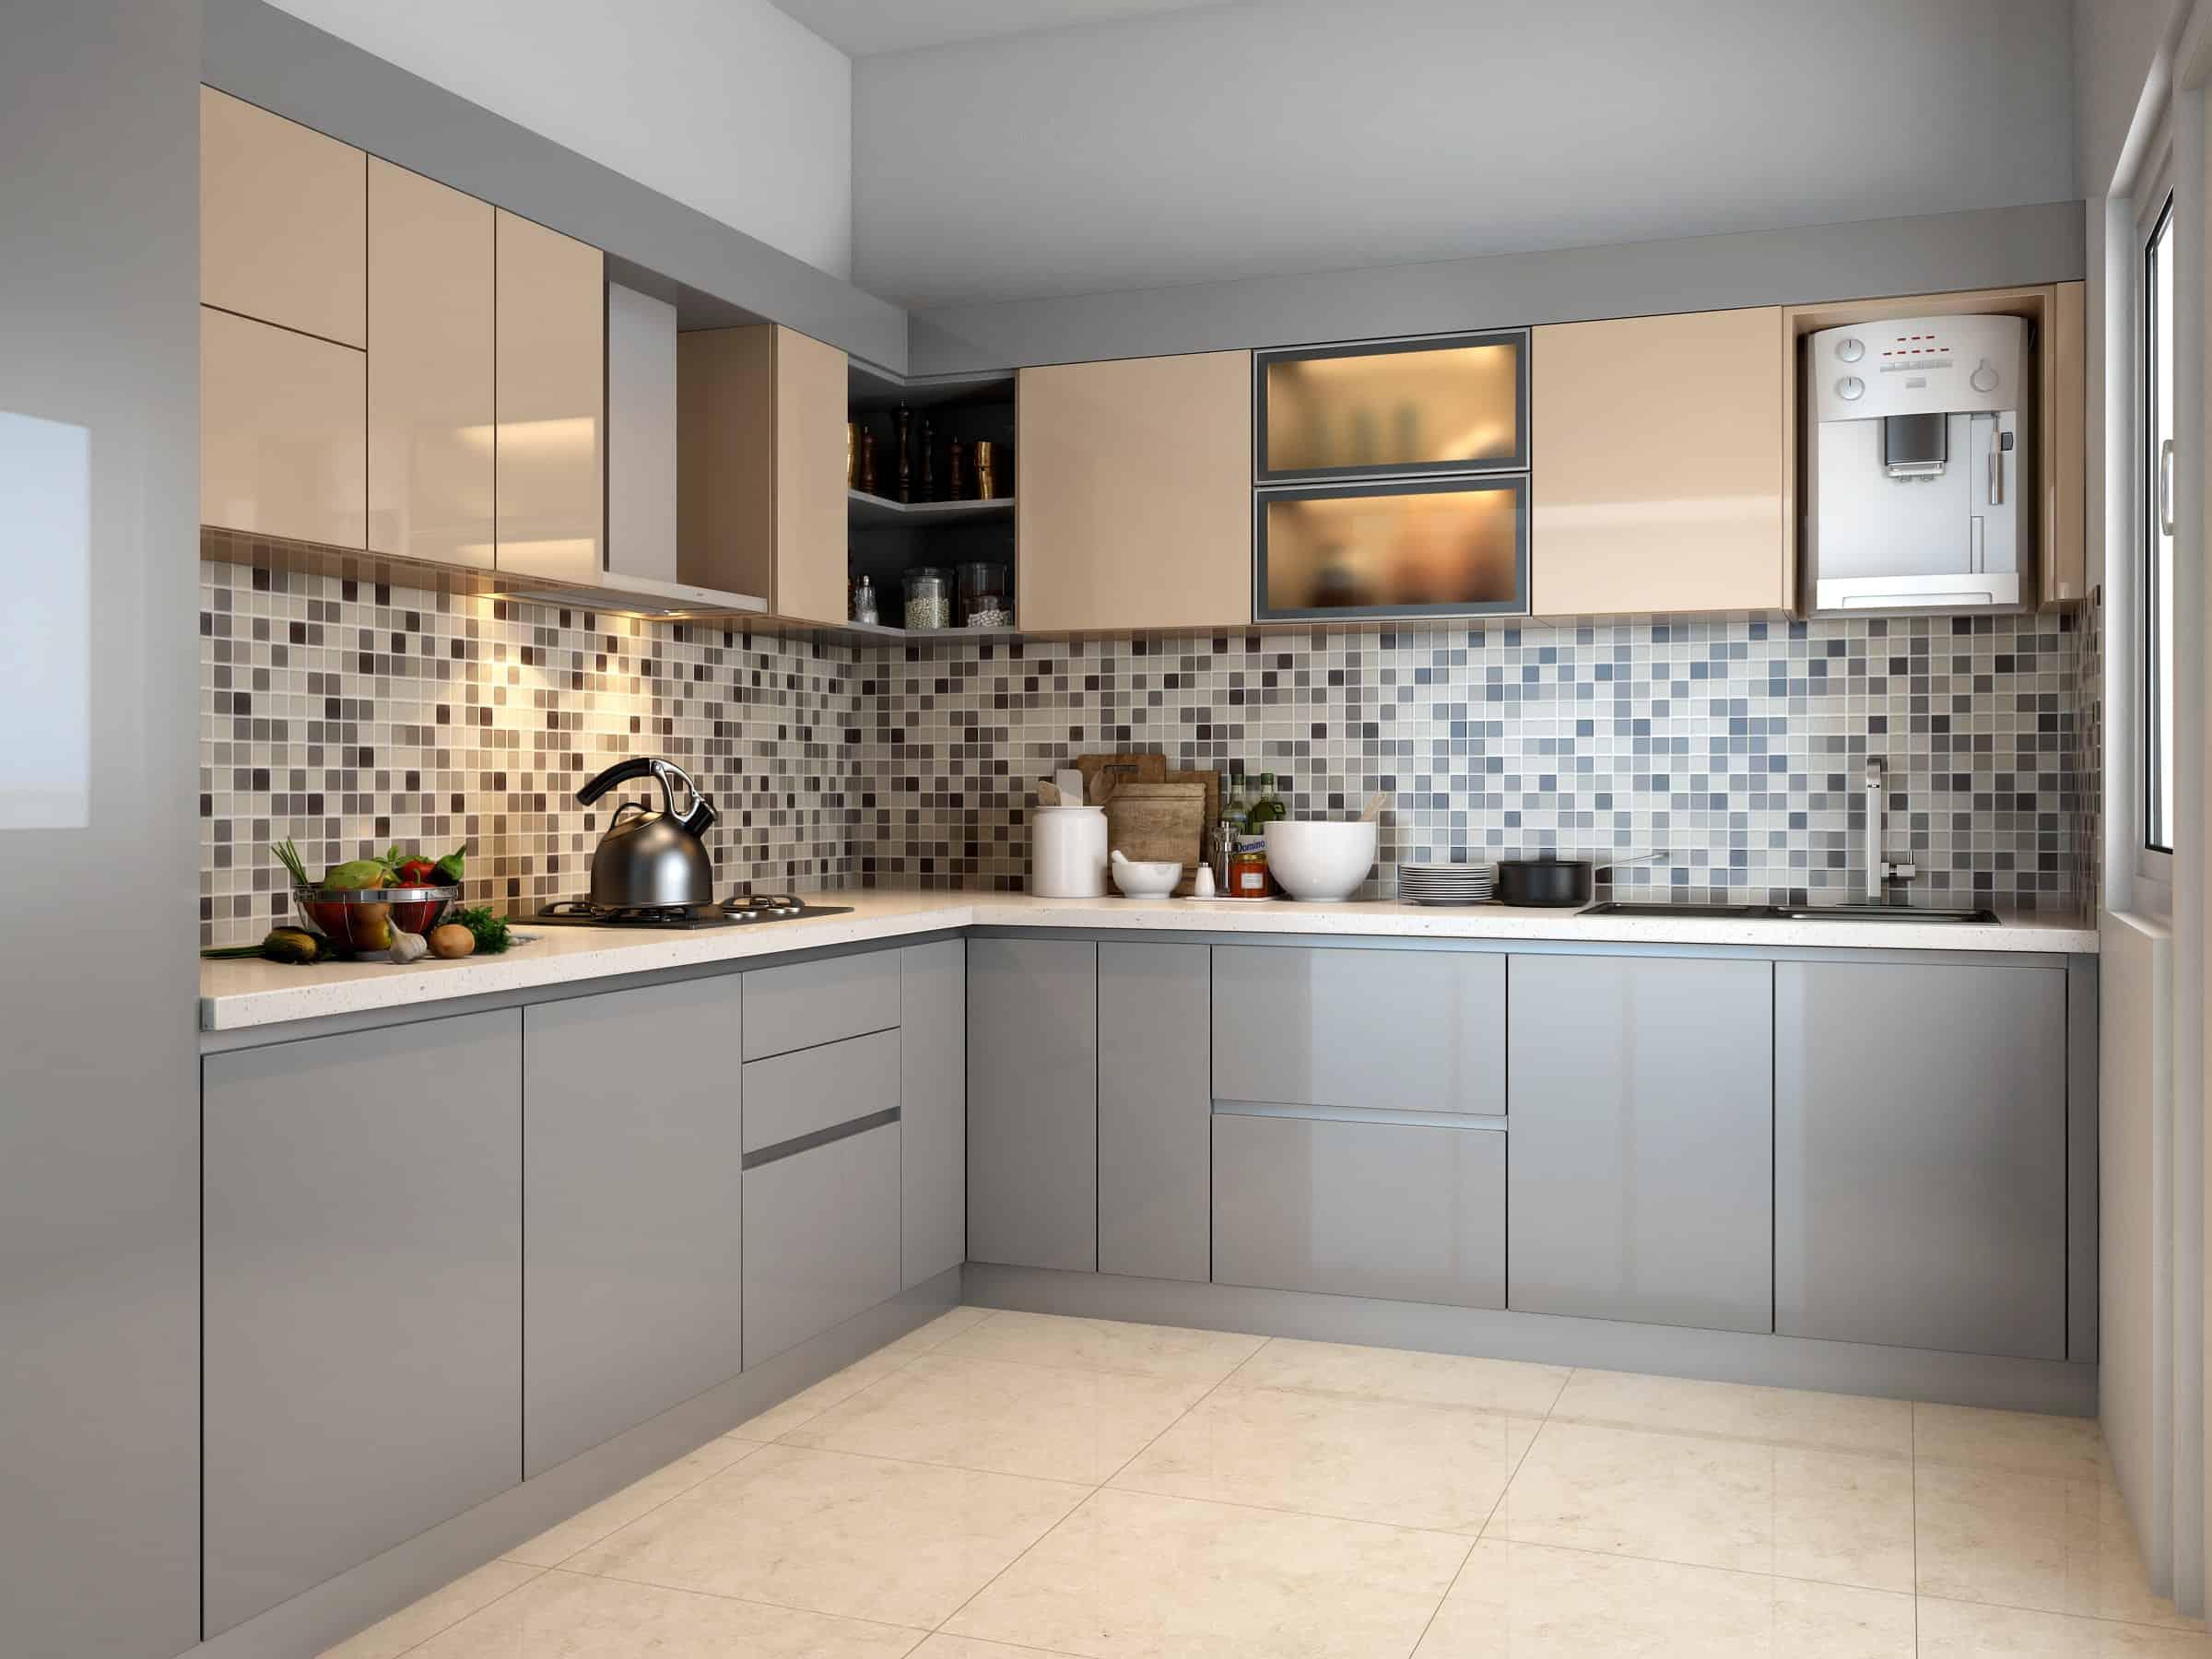 Kitchen Interior Design in Bangalore